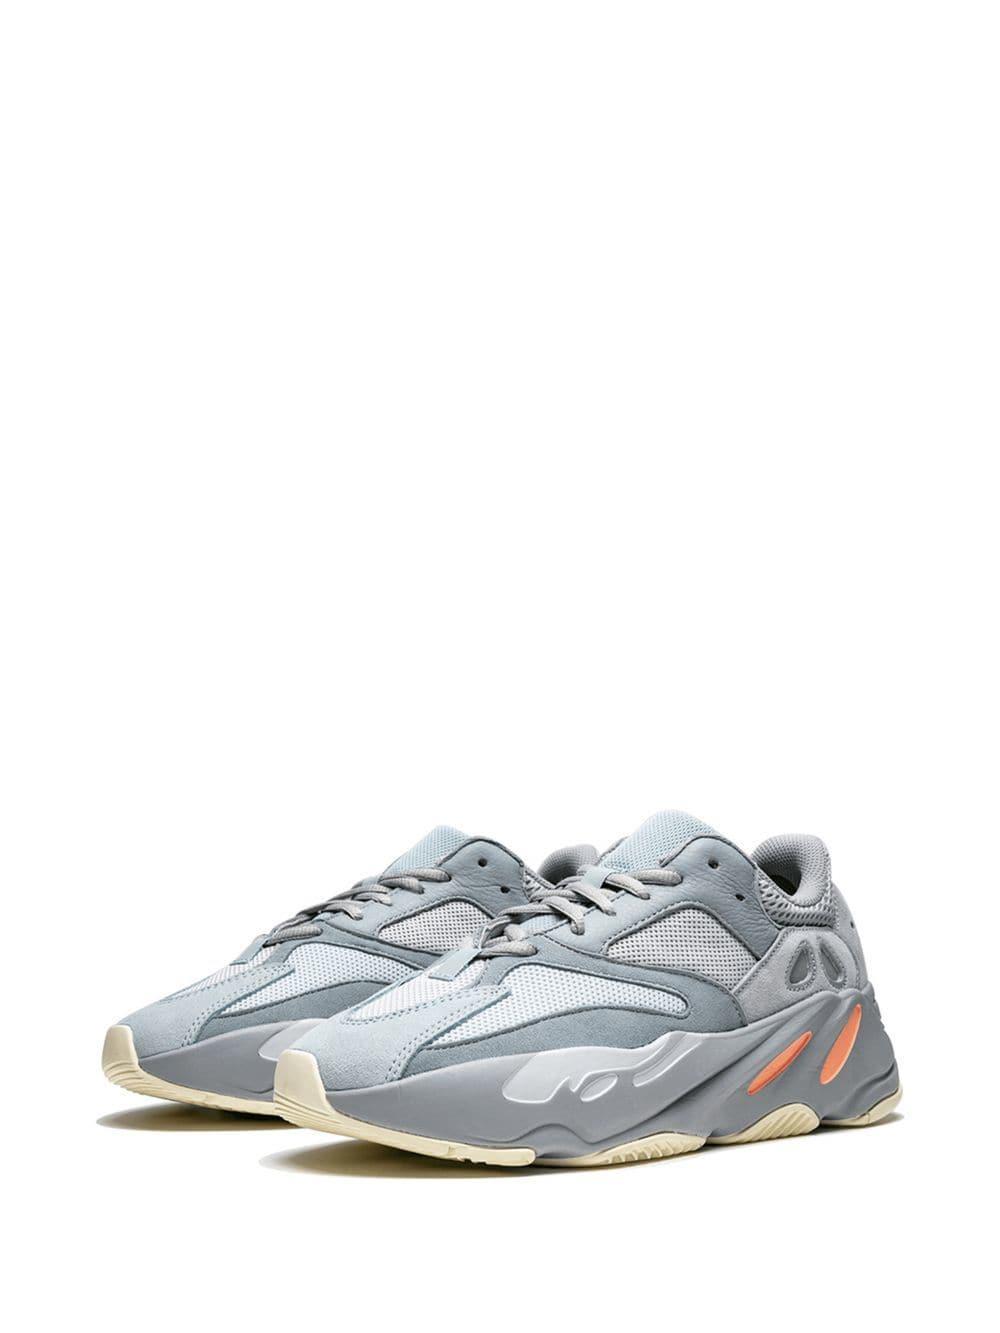 838ed43de7d66 adidas Yeezy Boost 700 for Men - Lyst